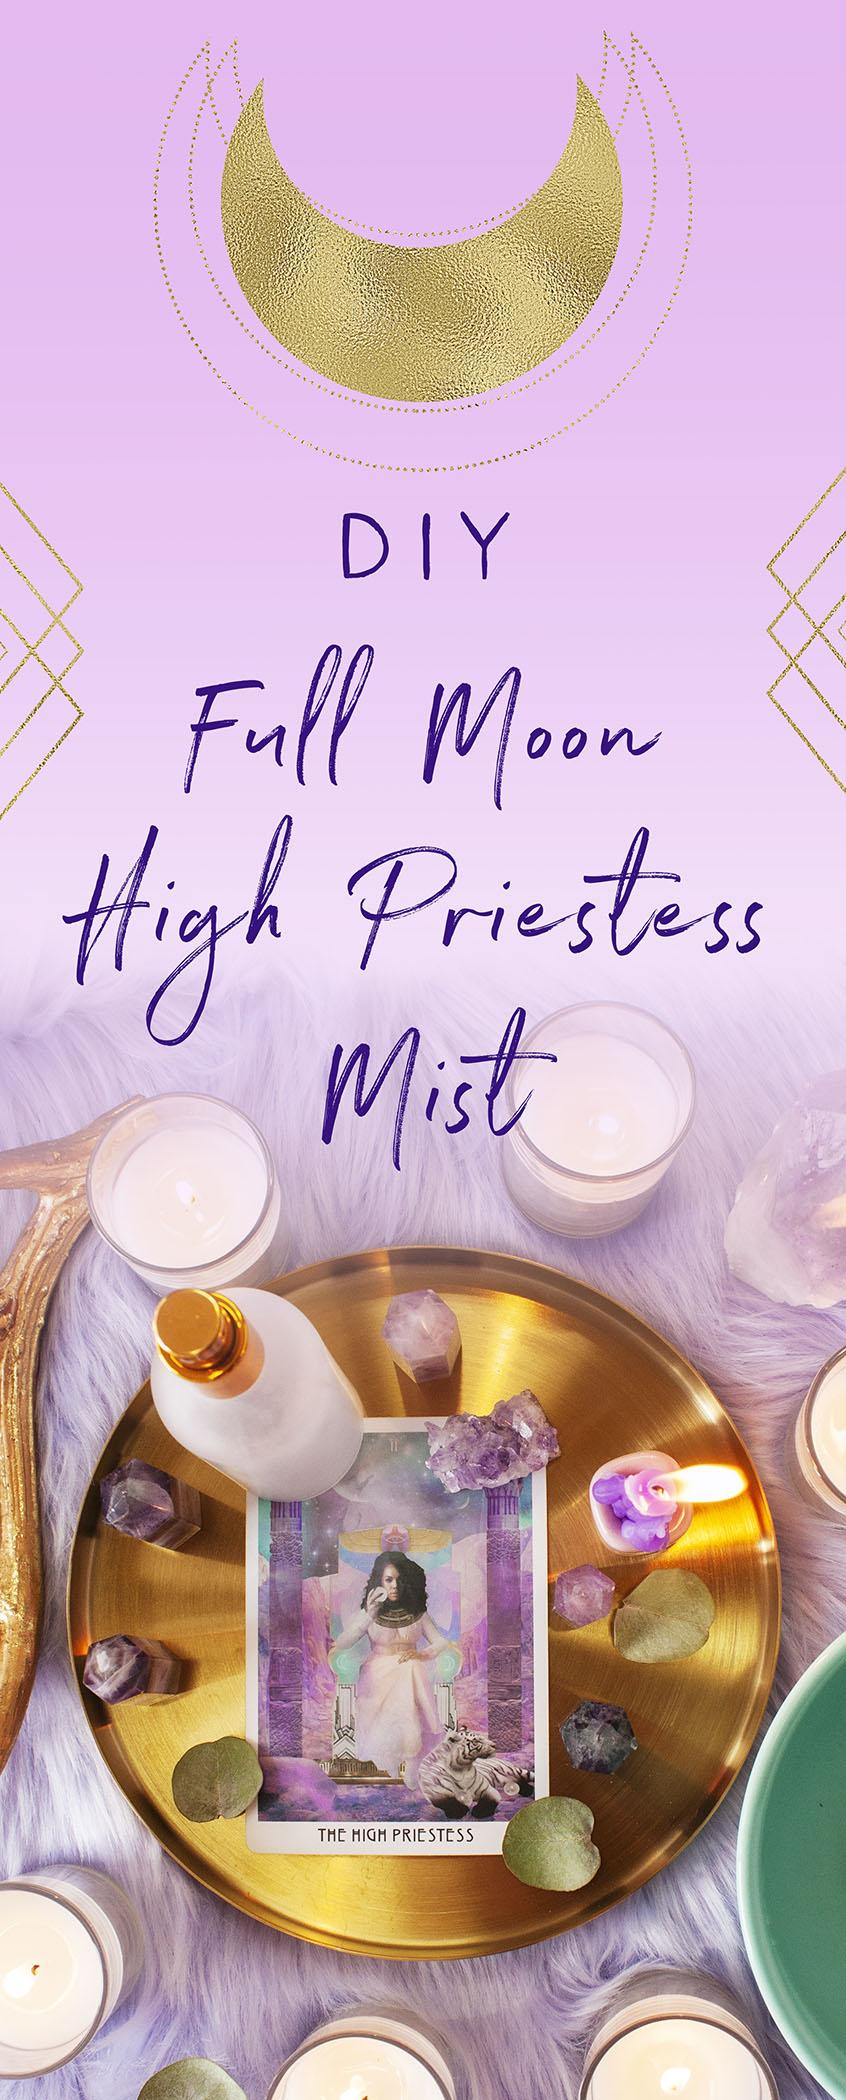 PIC2-DIY-FULL-moon-ritual-high-priestess-mist